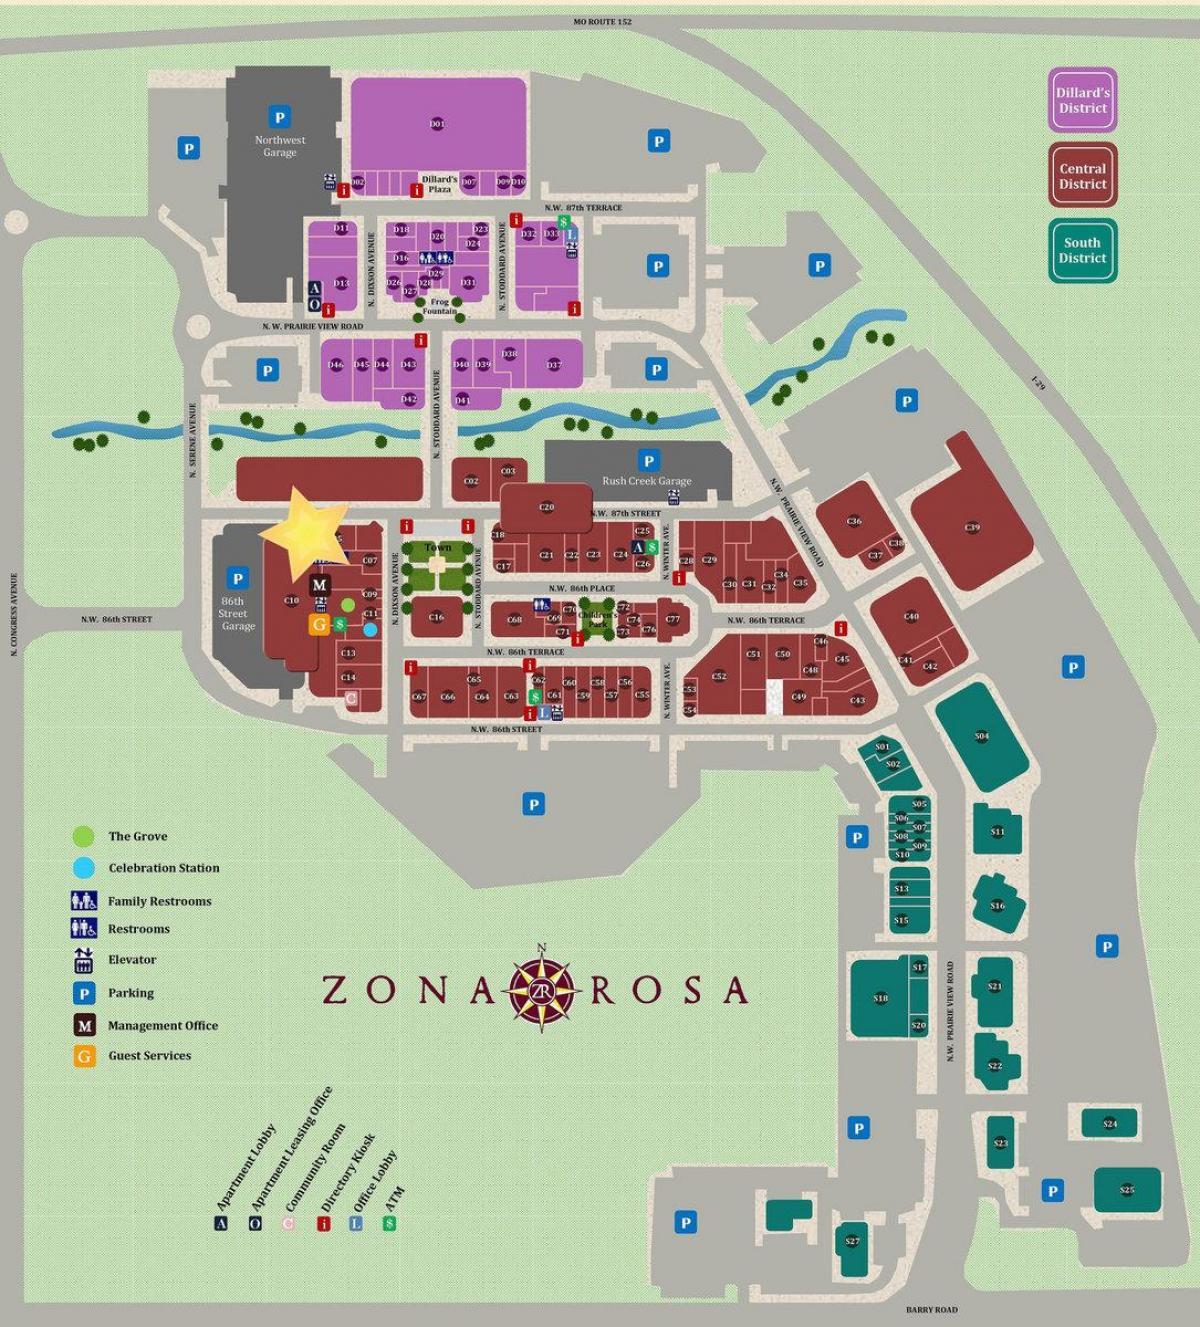 Zona rosa Karte - Zona rosa Mexiko-Stadt Karte (Mexiko) Zona Rosa Map on